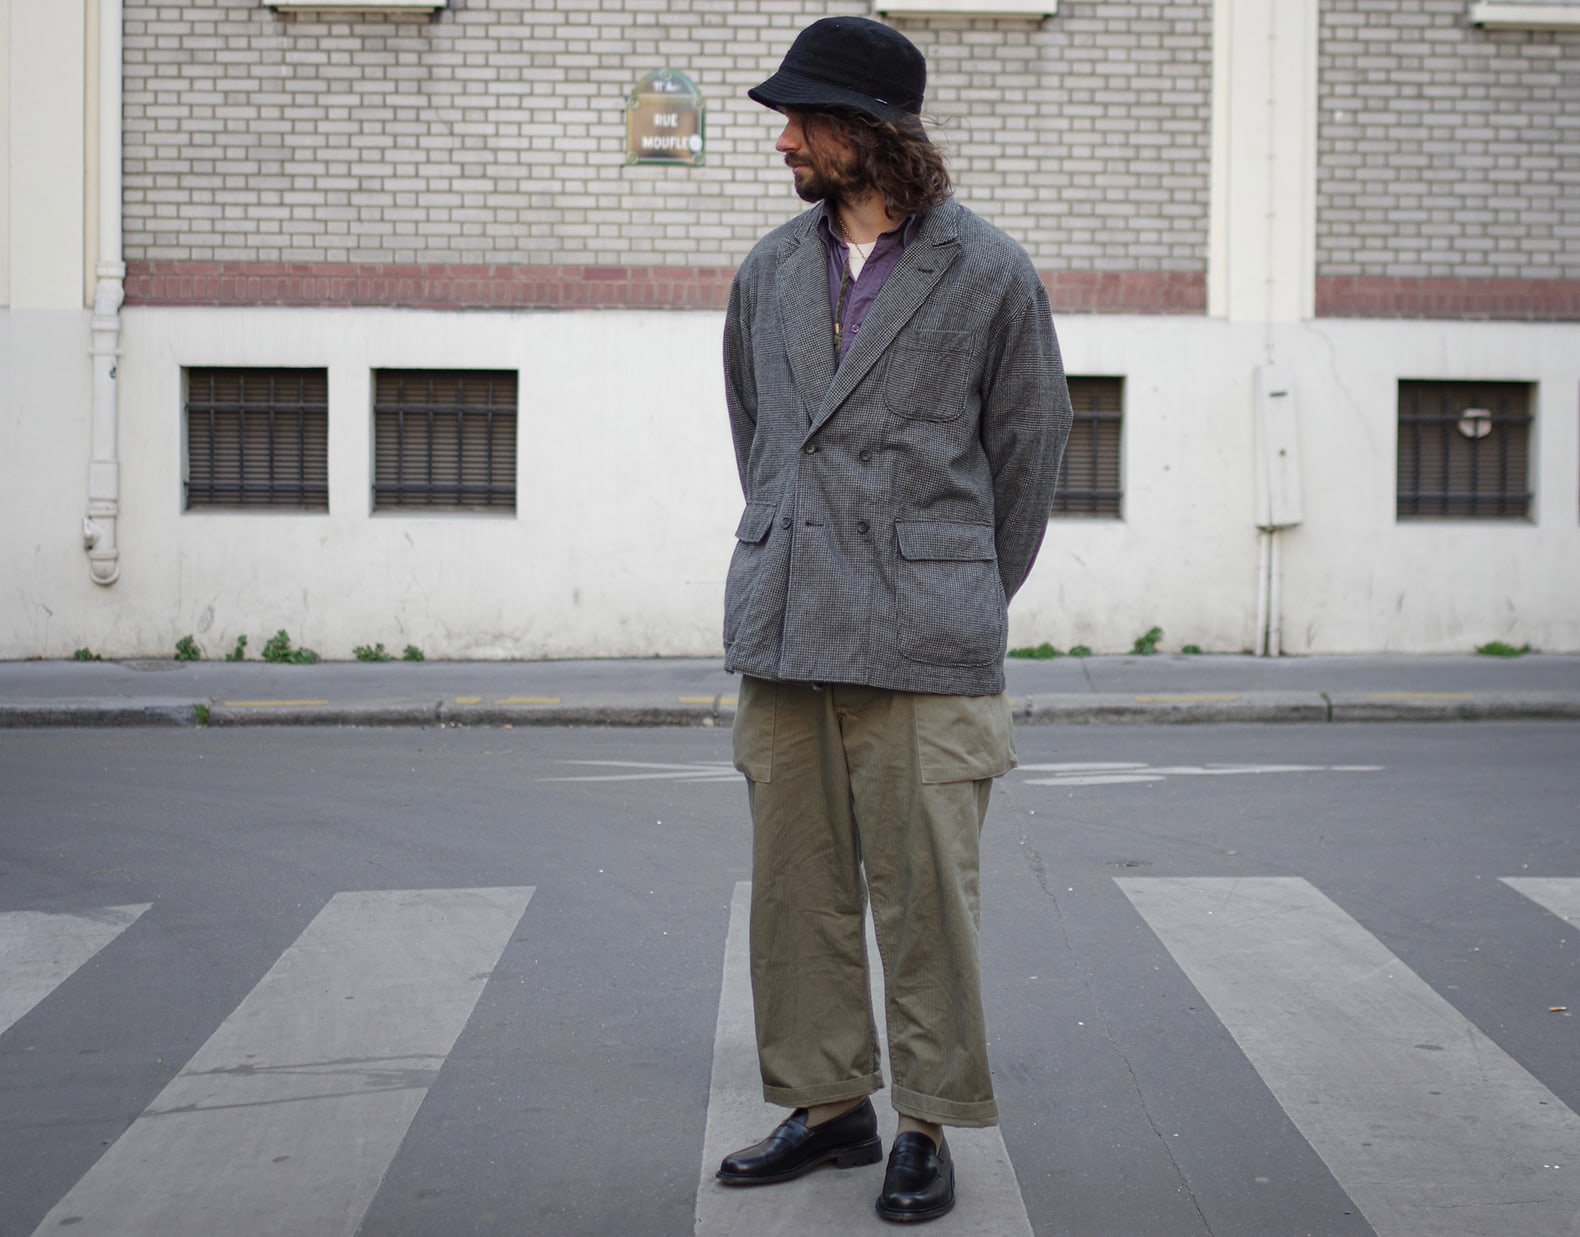 homme-look-oversized-jaonais-cargo-pantalon-blazer-croisé-bb